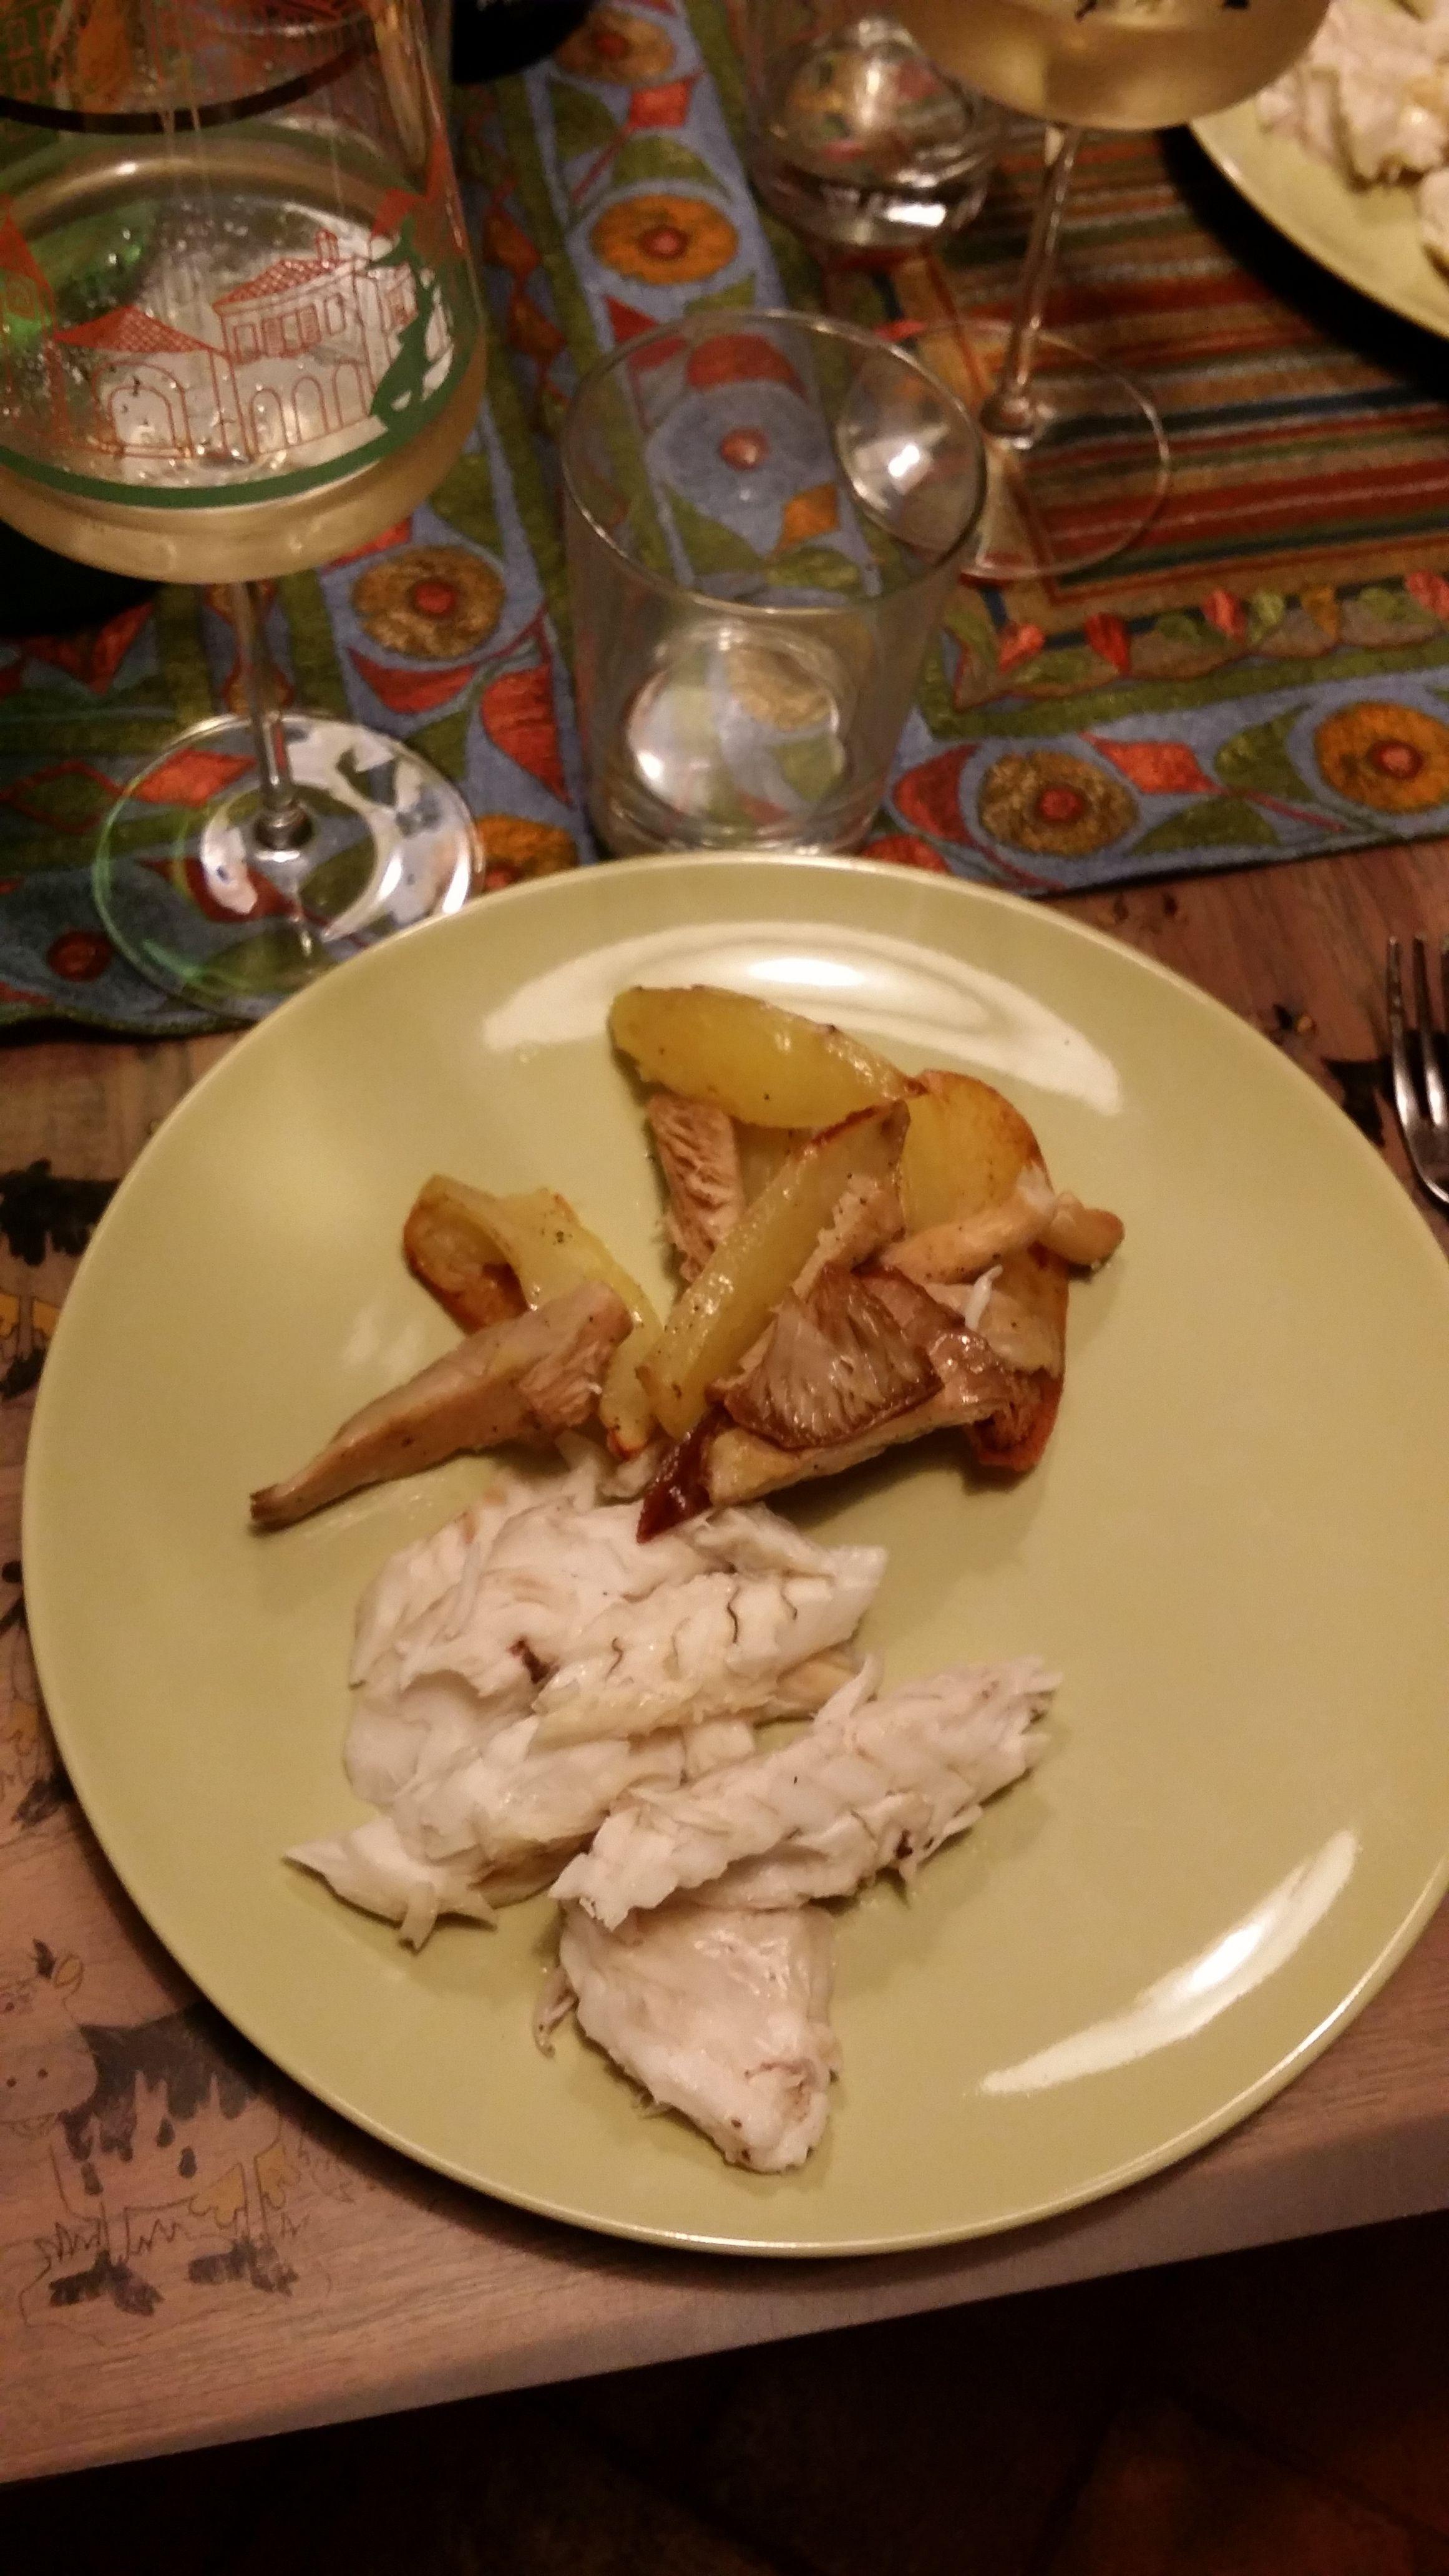 my sea bass mushrooms and potatoes yummi!